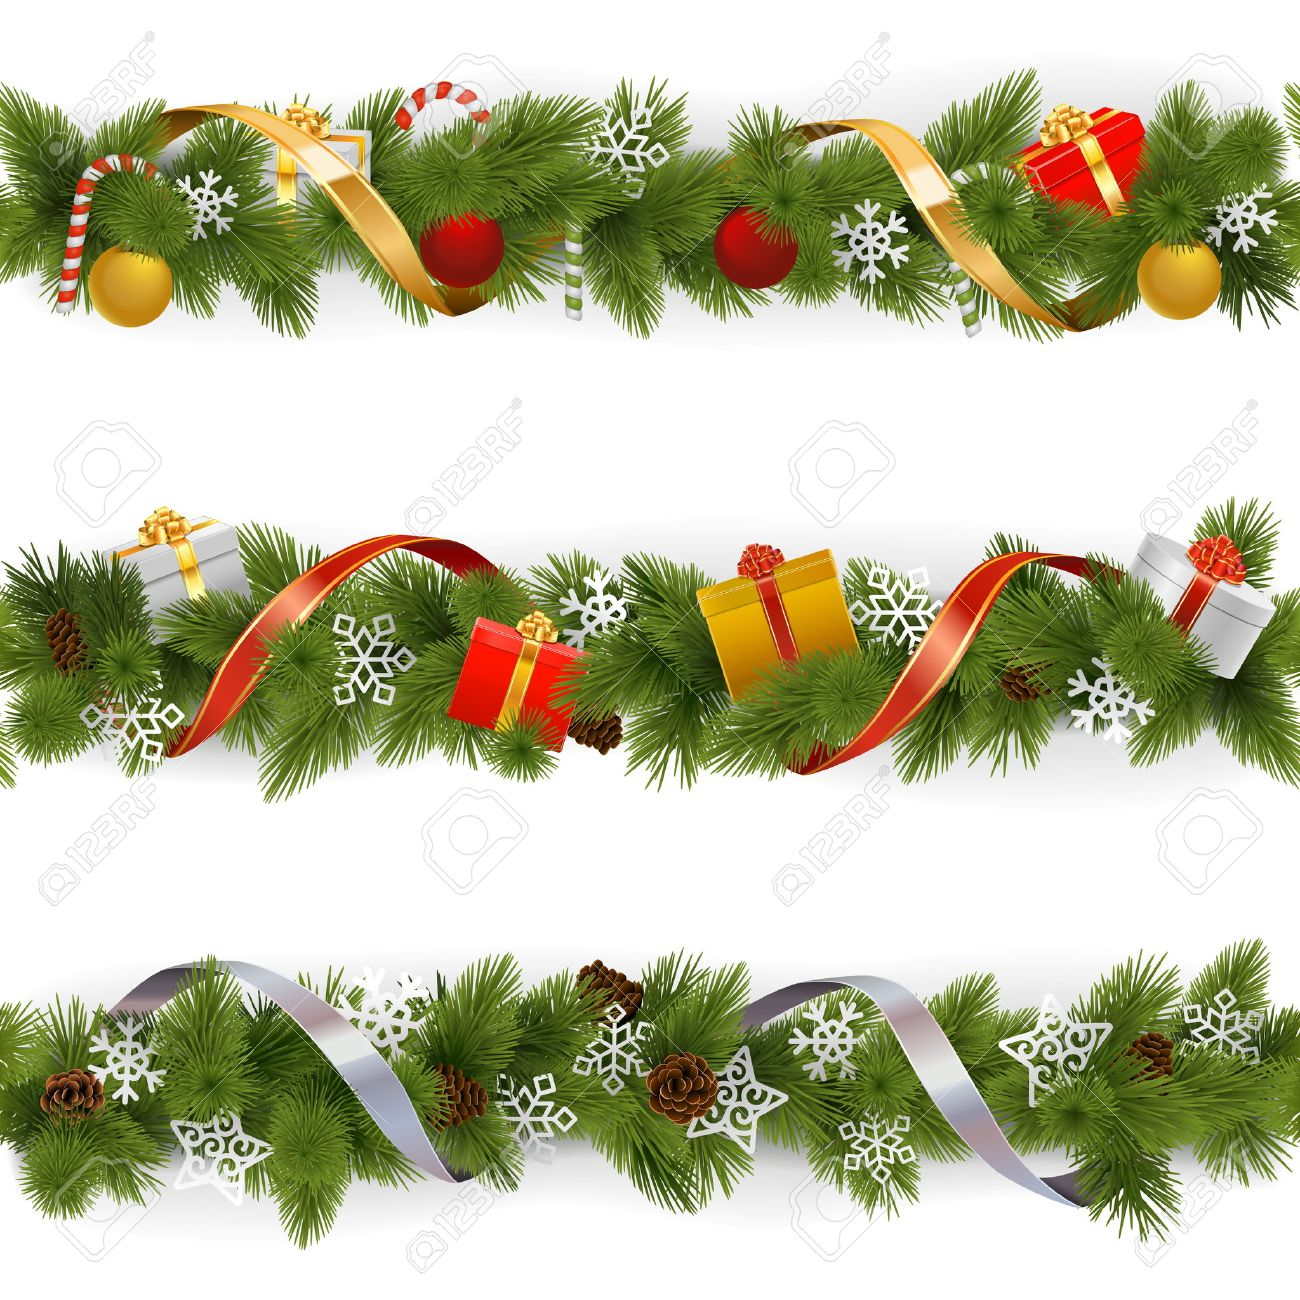 Vector Christmas Border Set 3 isolated on white background - 49604866